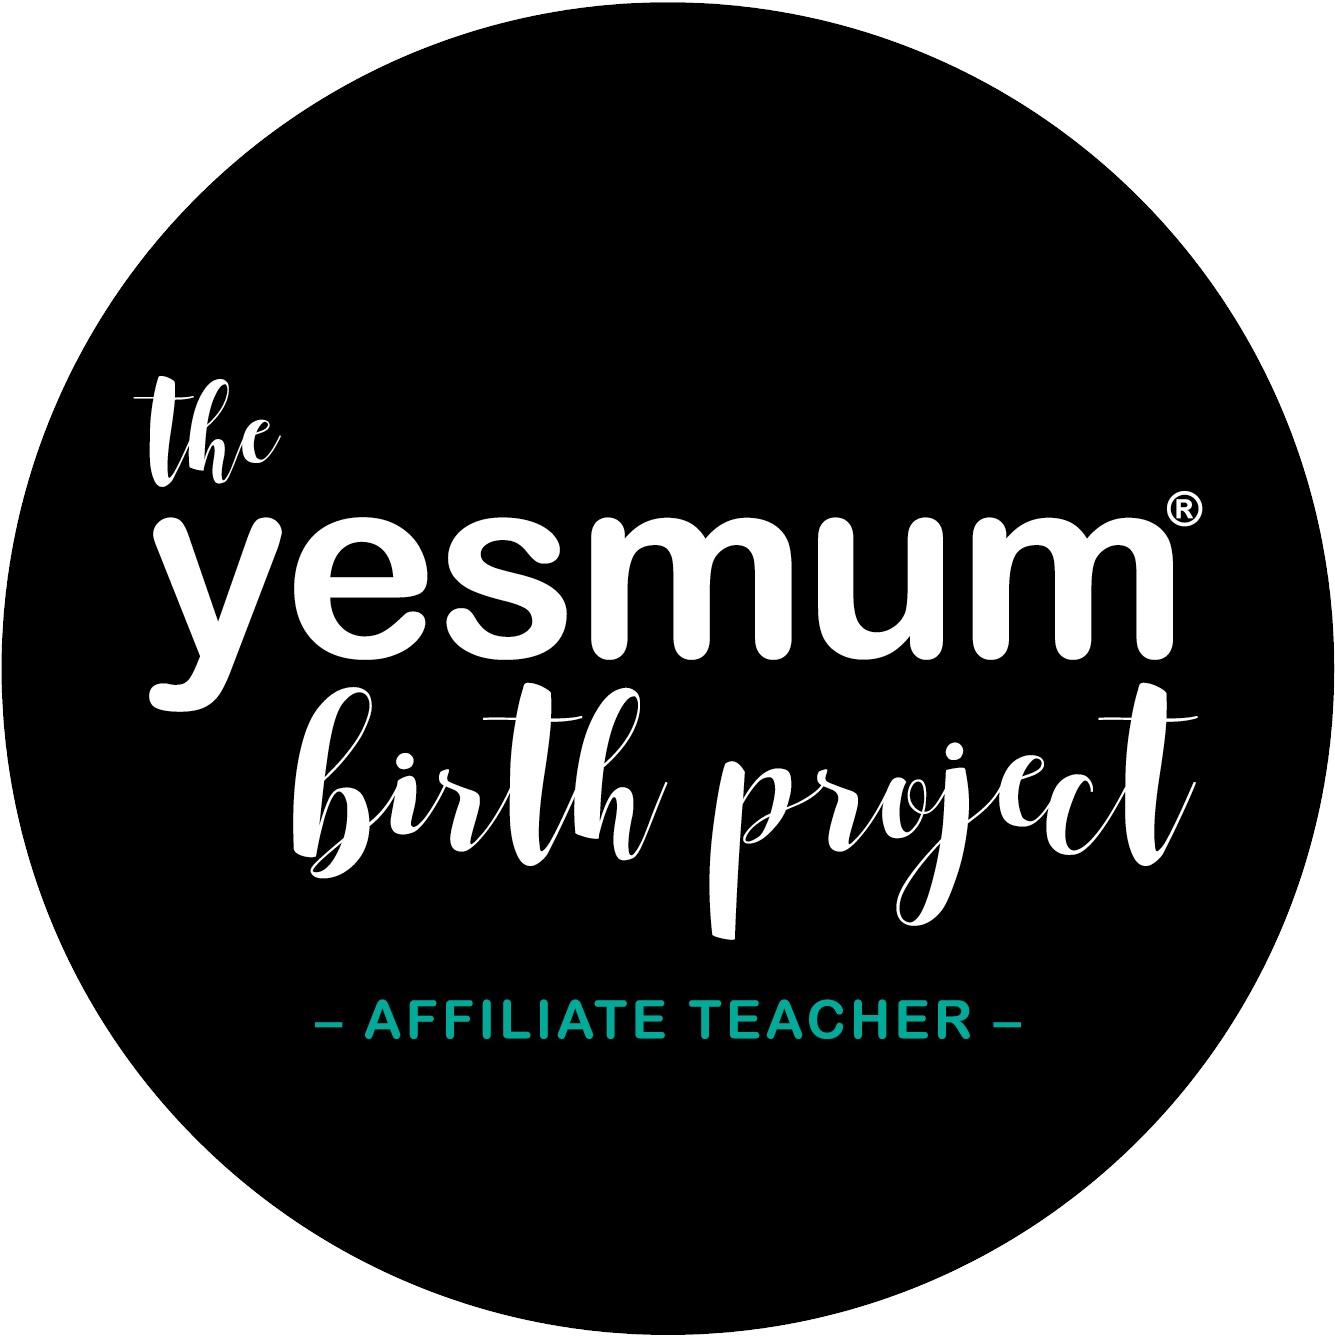 £theyesmumbirthproject